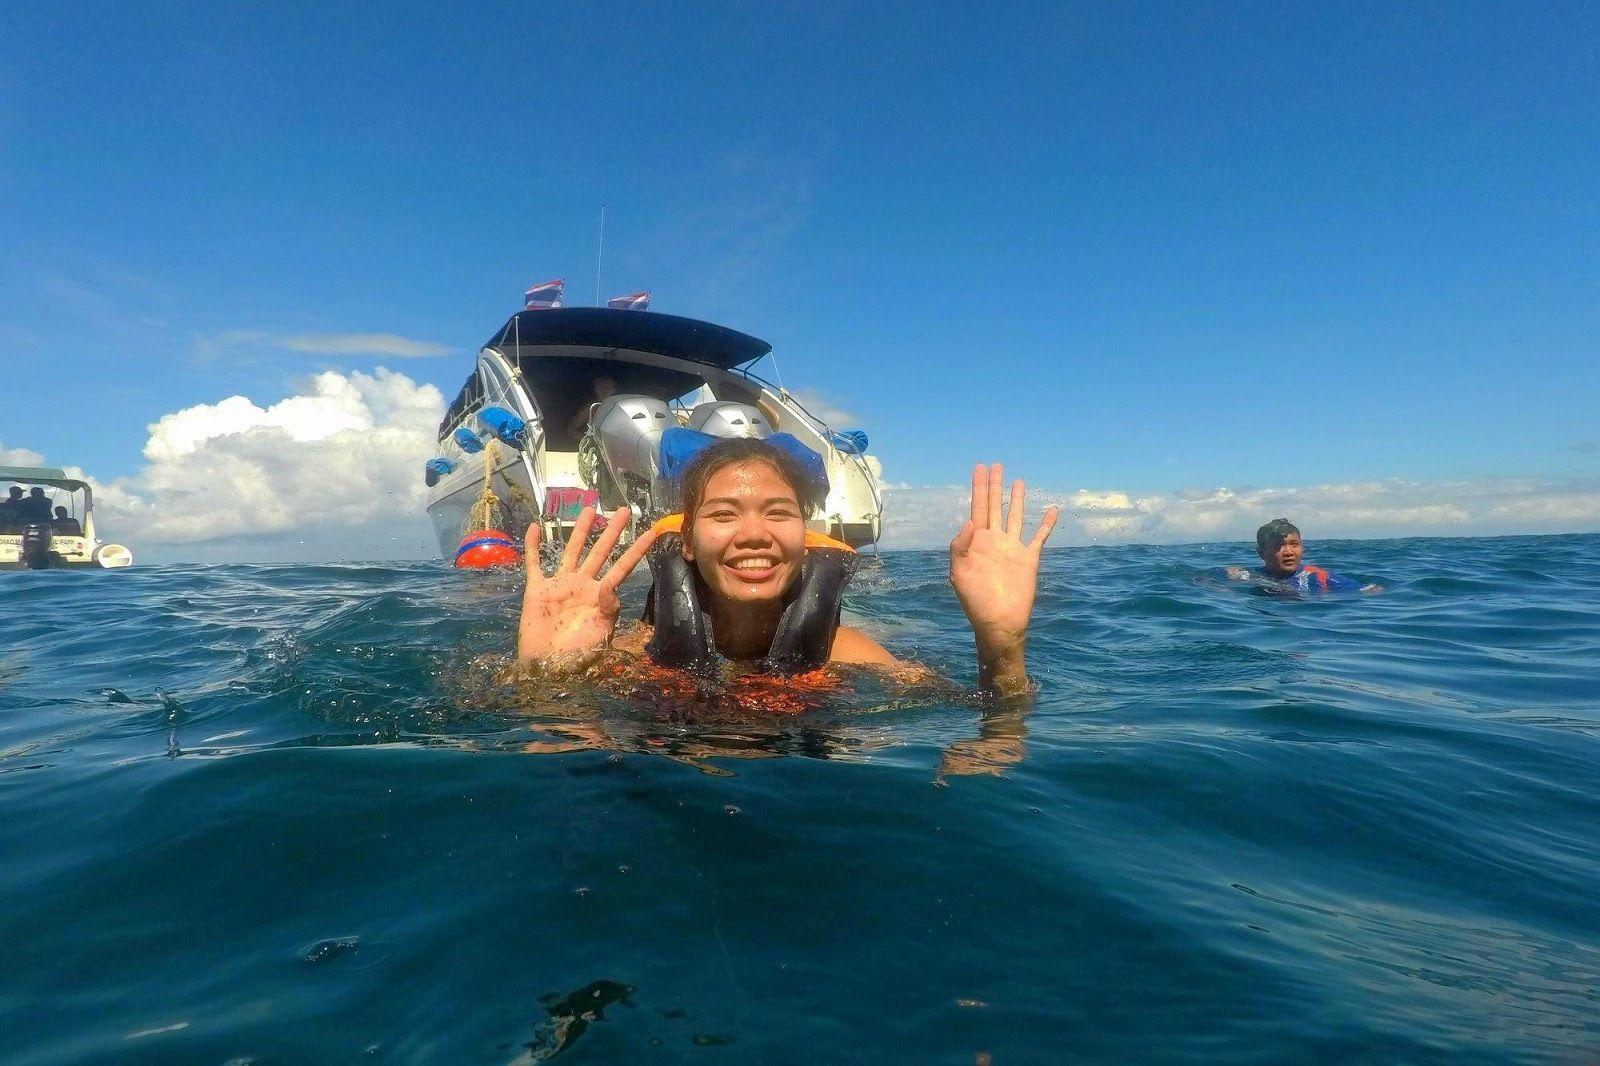 Tin Adventure Sea Tour to 4 Islands & Emerald Cave from Koh Lanta